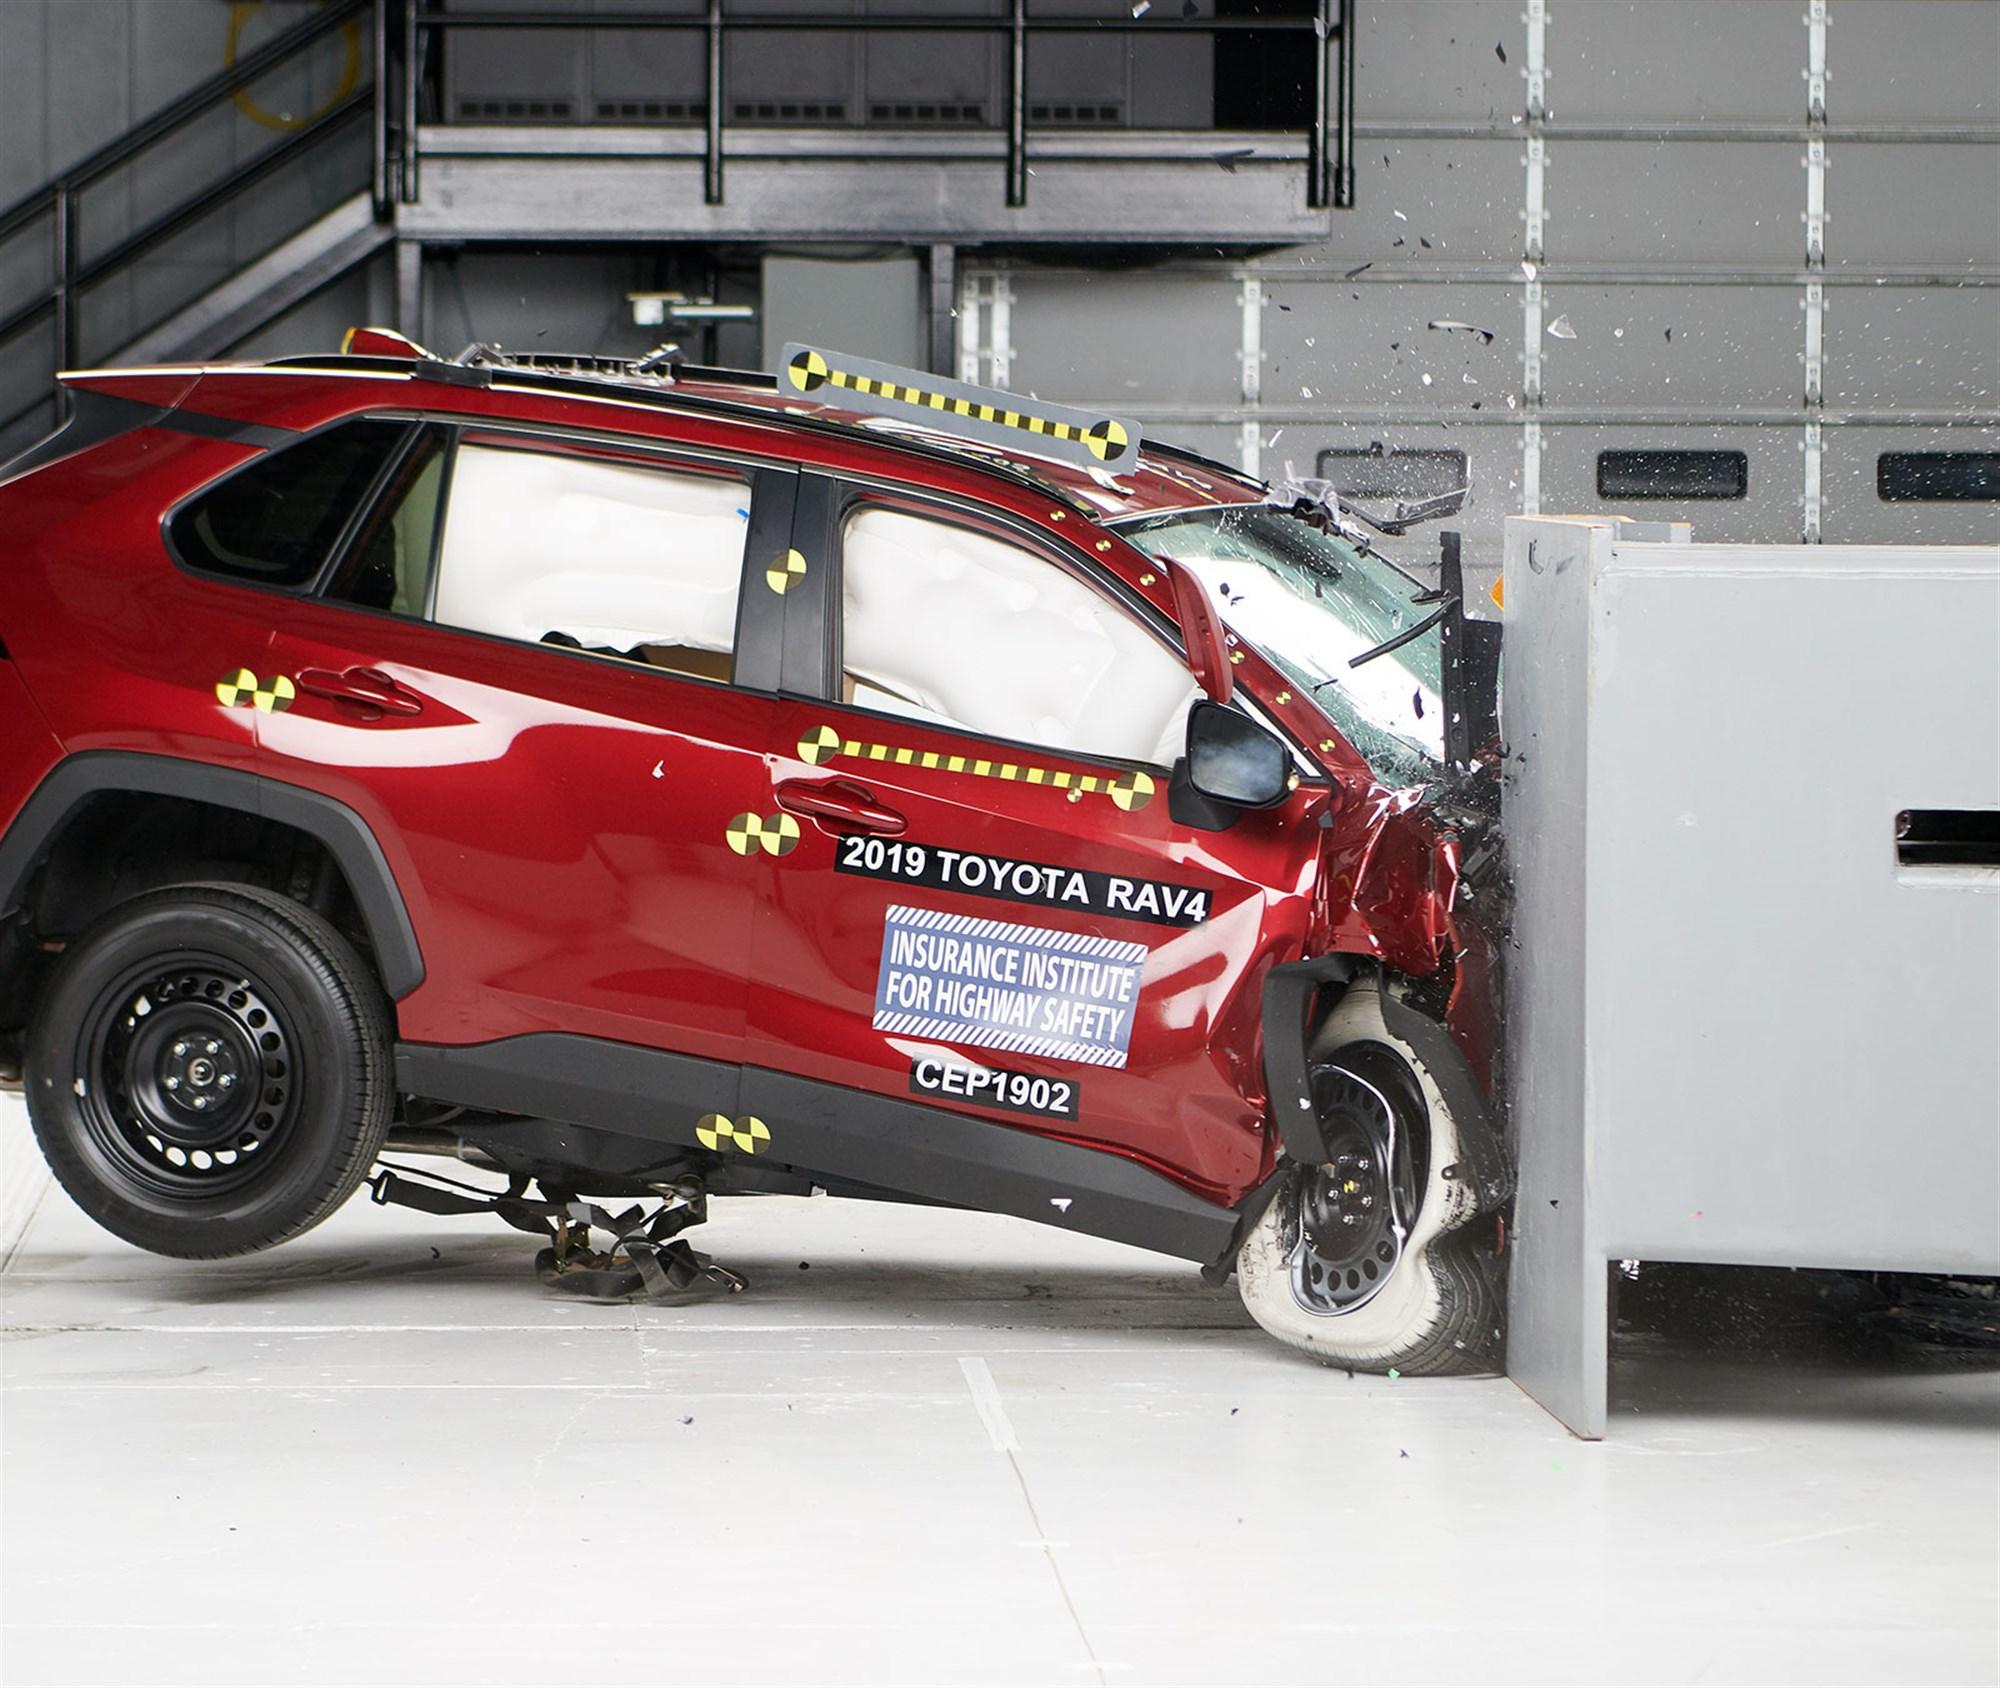 2016 Dodge Charger SRT Hellcat: Real-World Fuel Economy